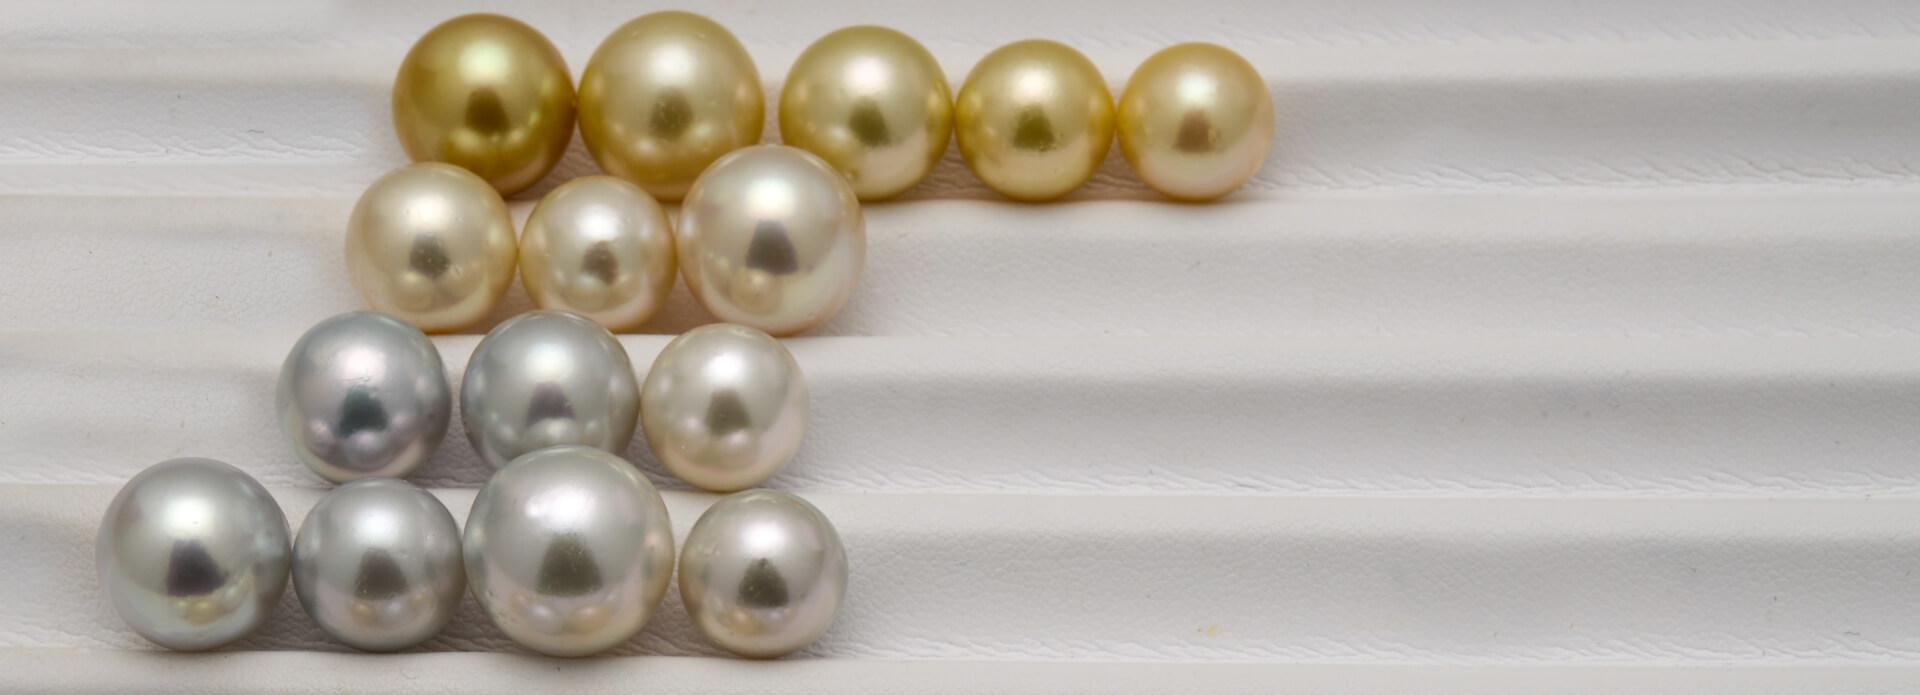 South Sea Pearl Grading